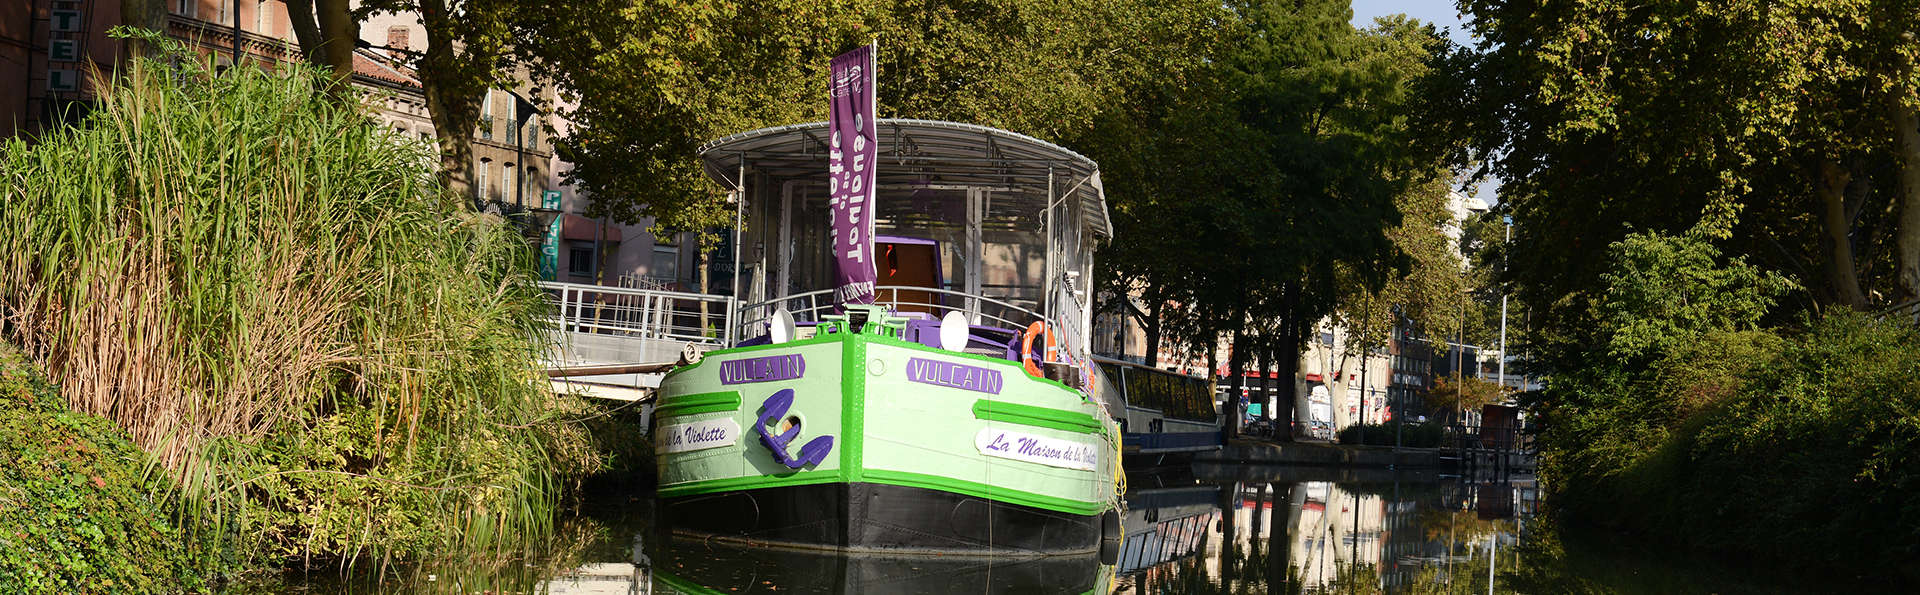 Descubre la Ciudad Rosa con el City Pass Premium de Toulouse